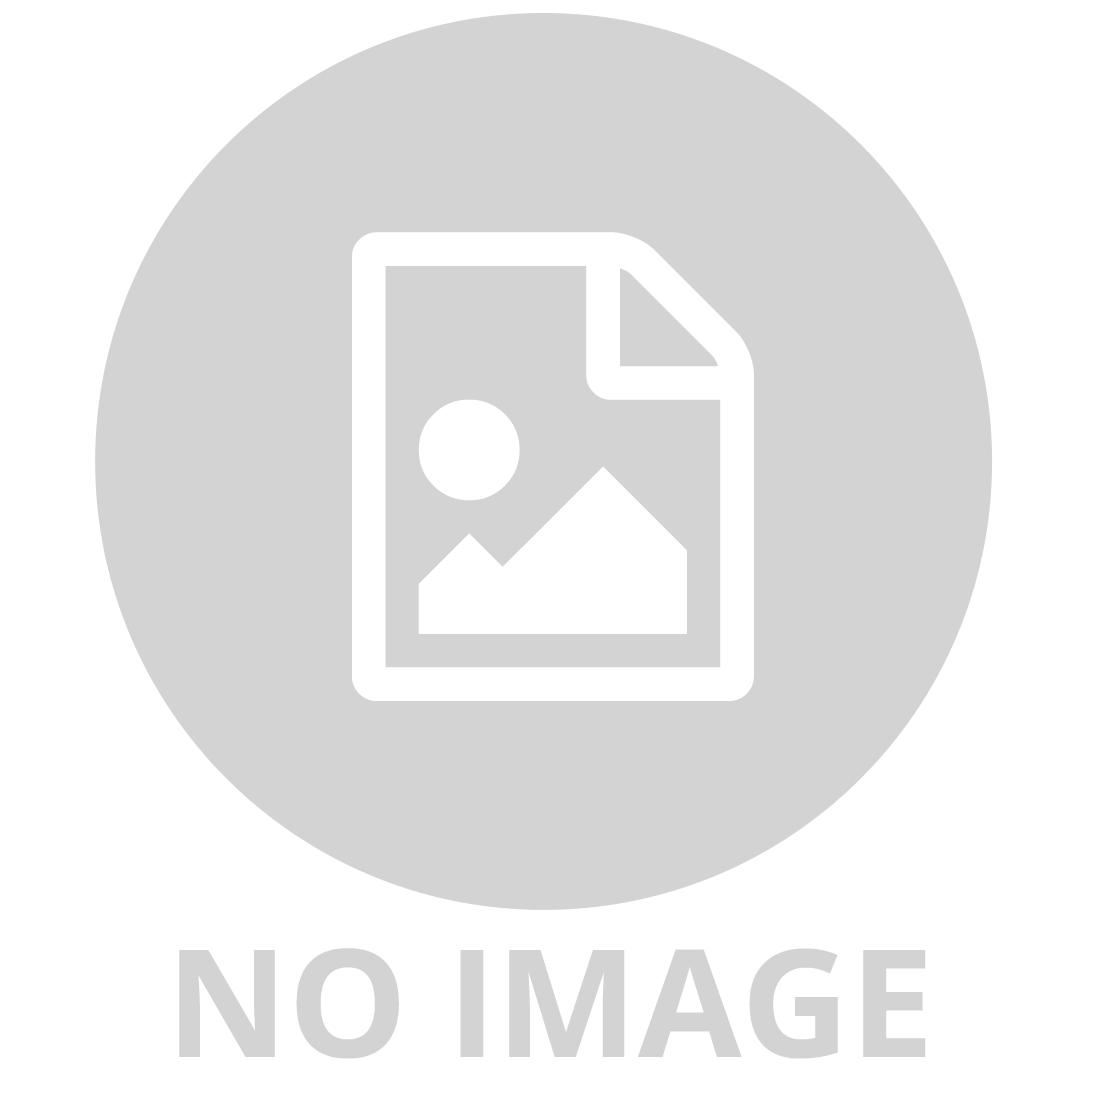 PHLAT BALL FLASH